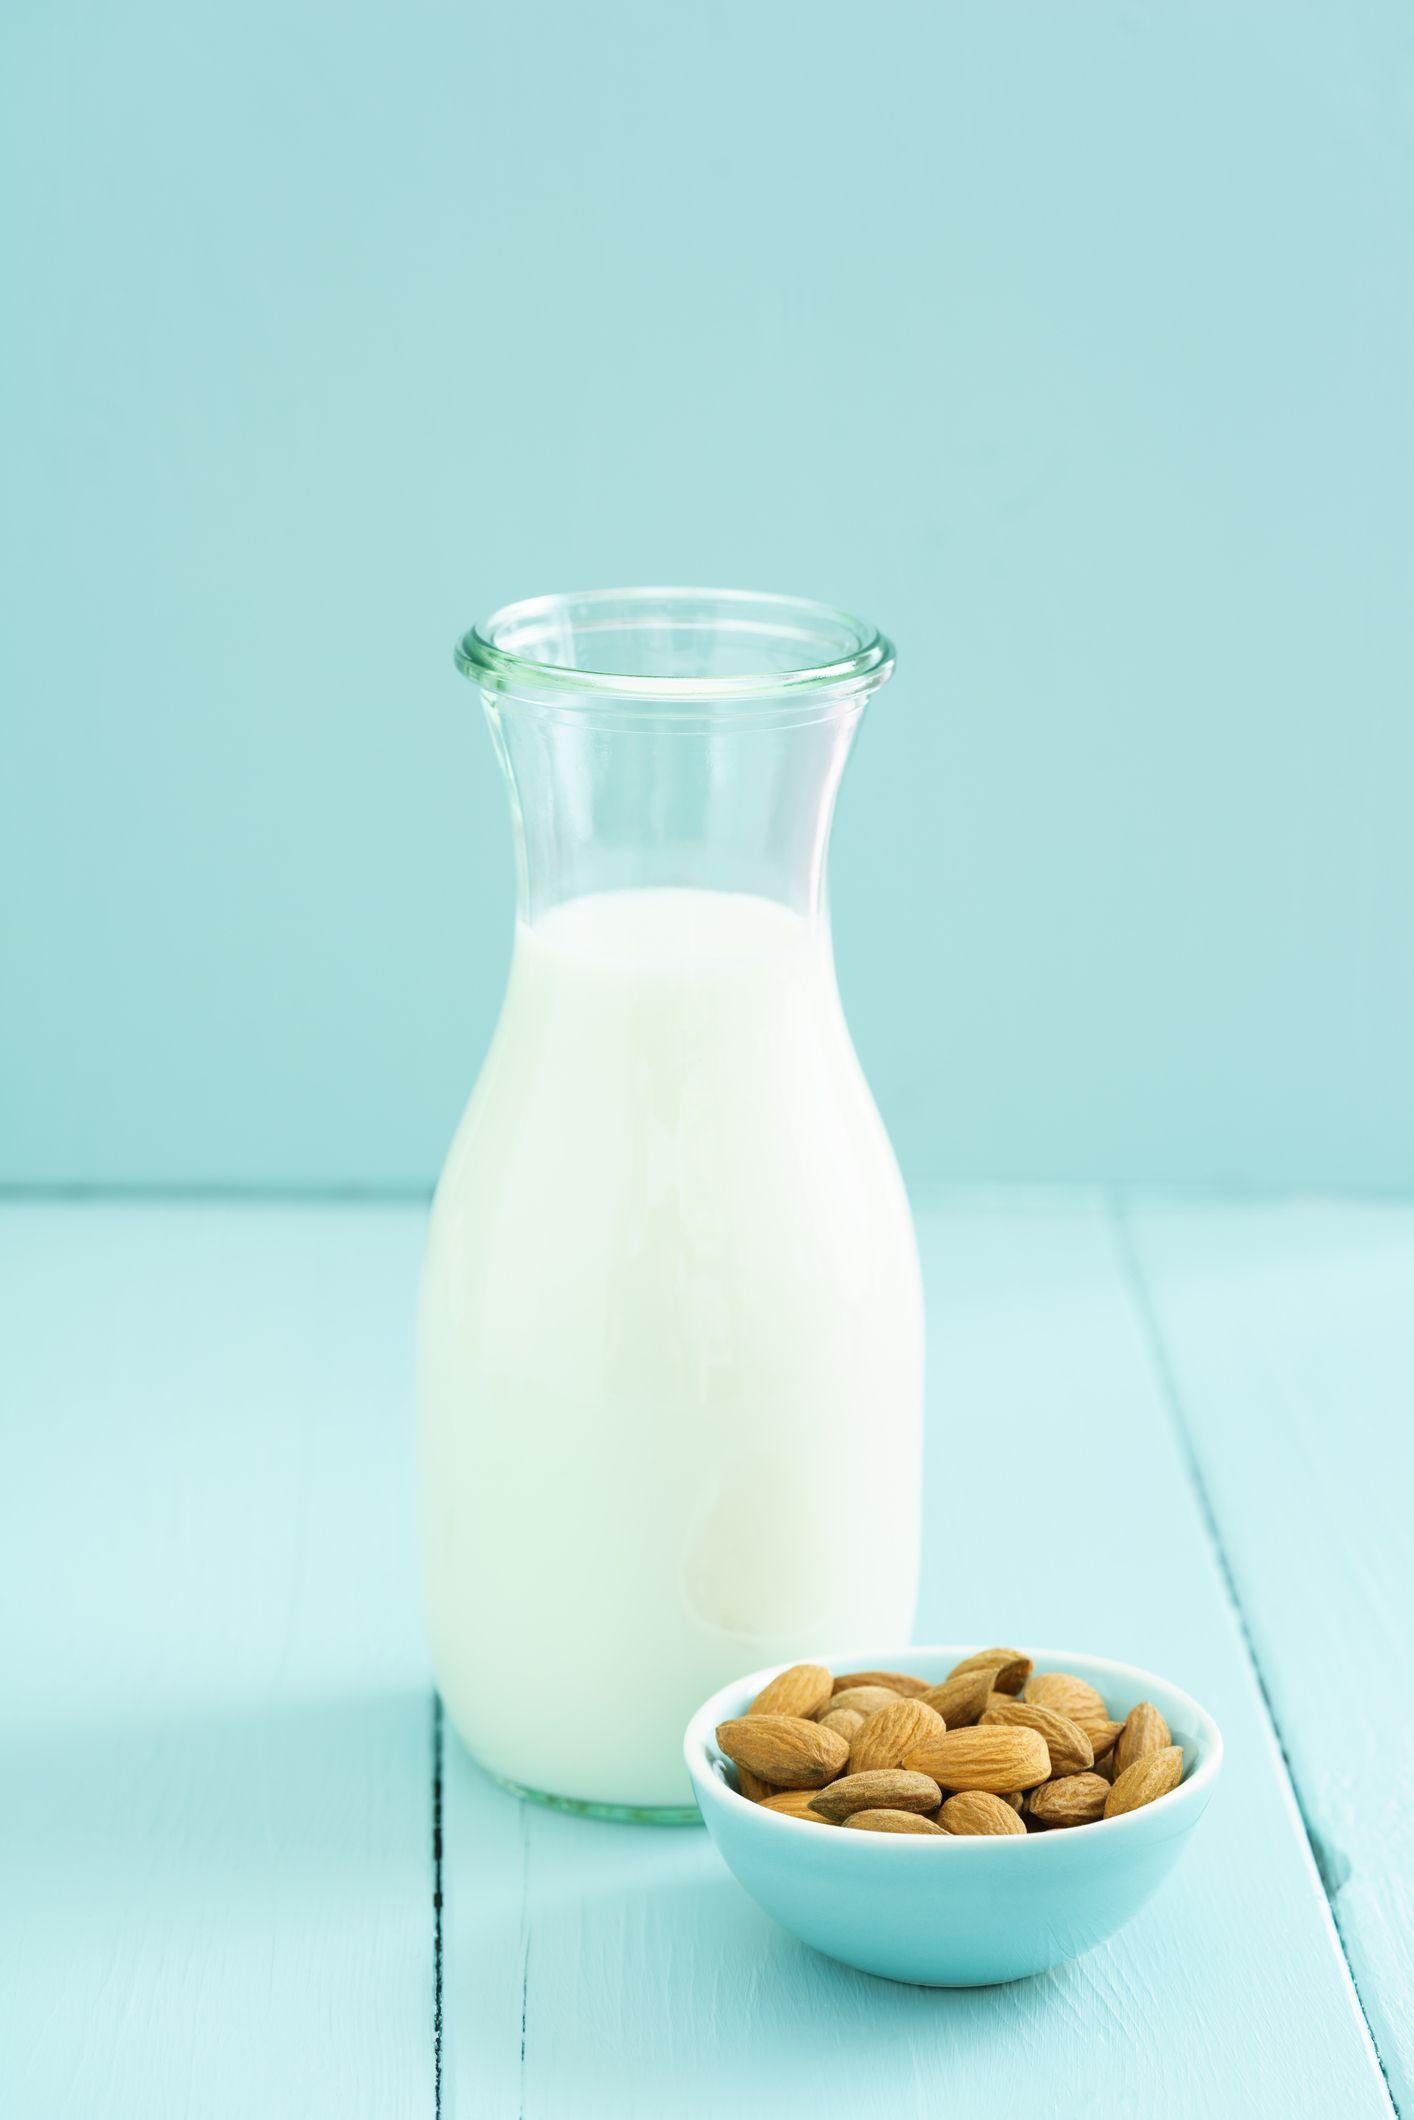 plant-based milks anti-aging foods for women